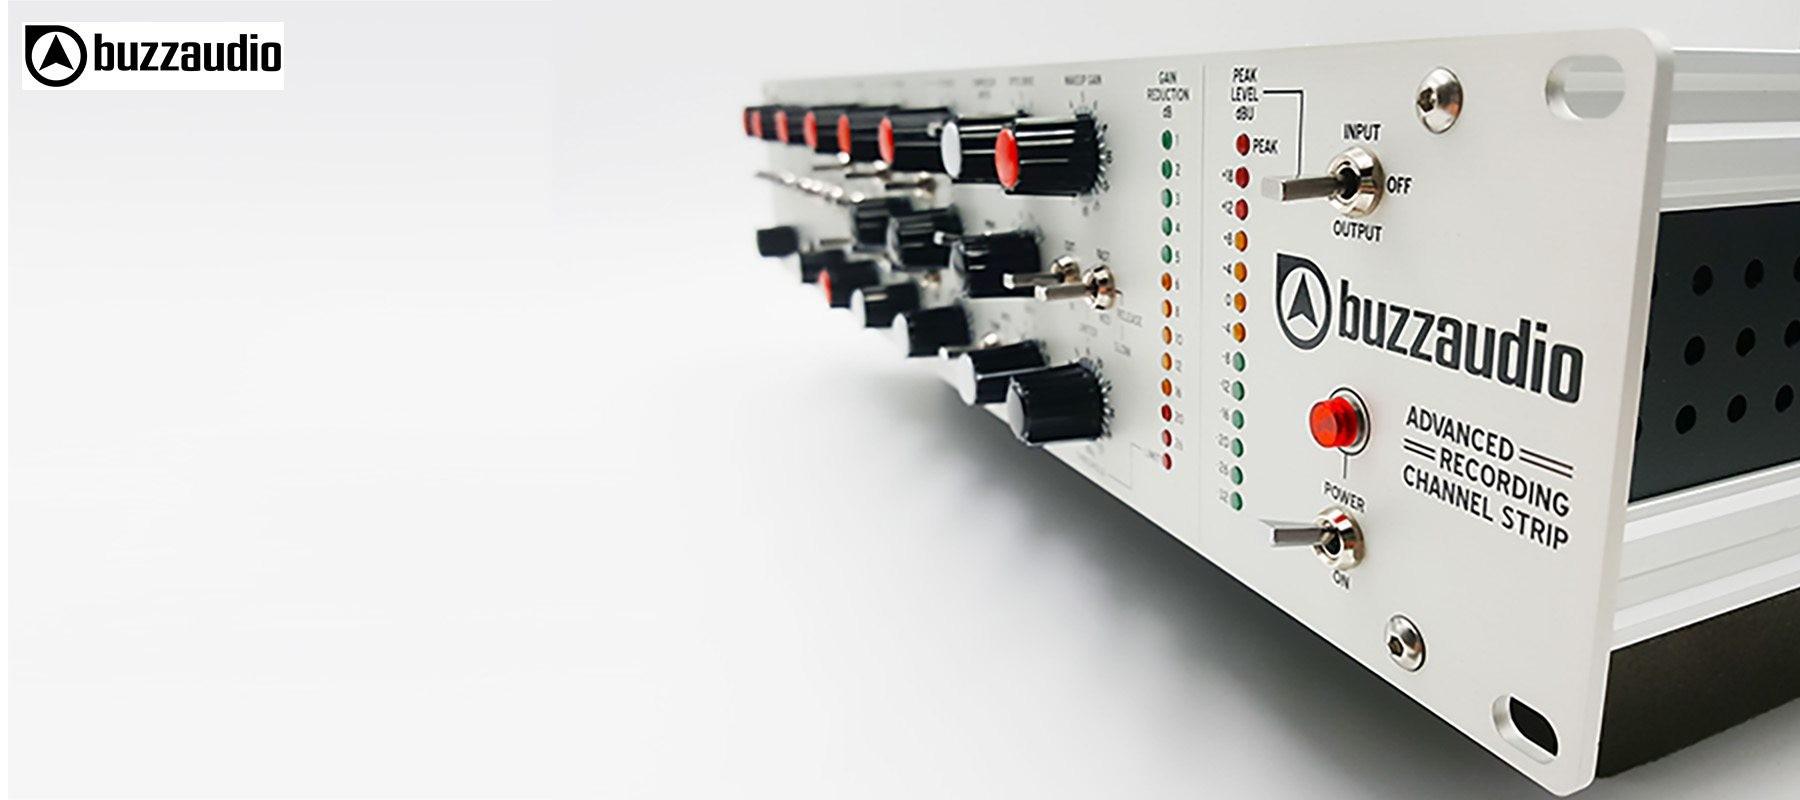 Buzz Audio ARC-1.1 - Right